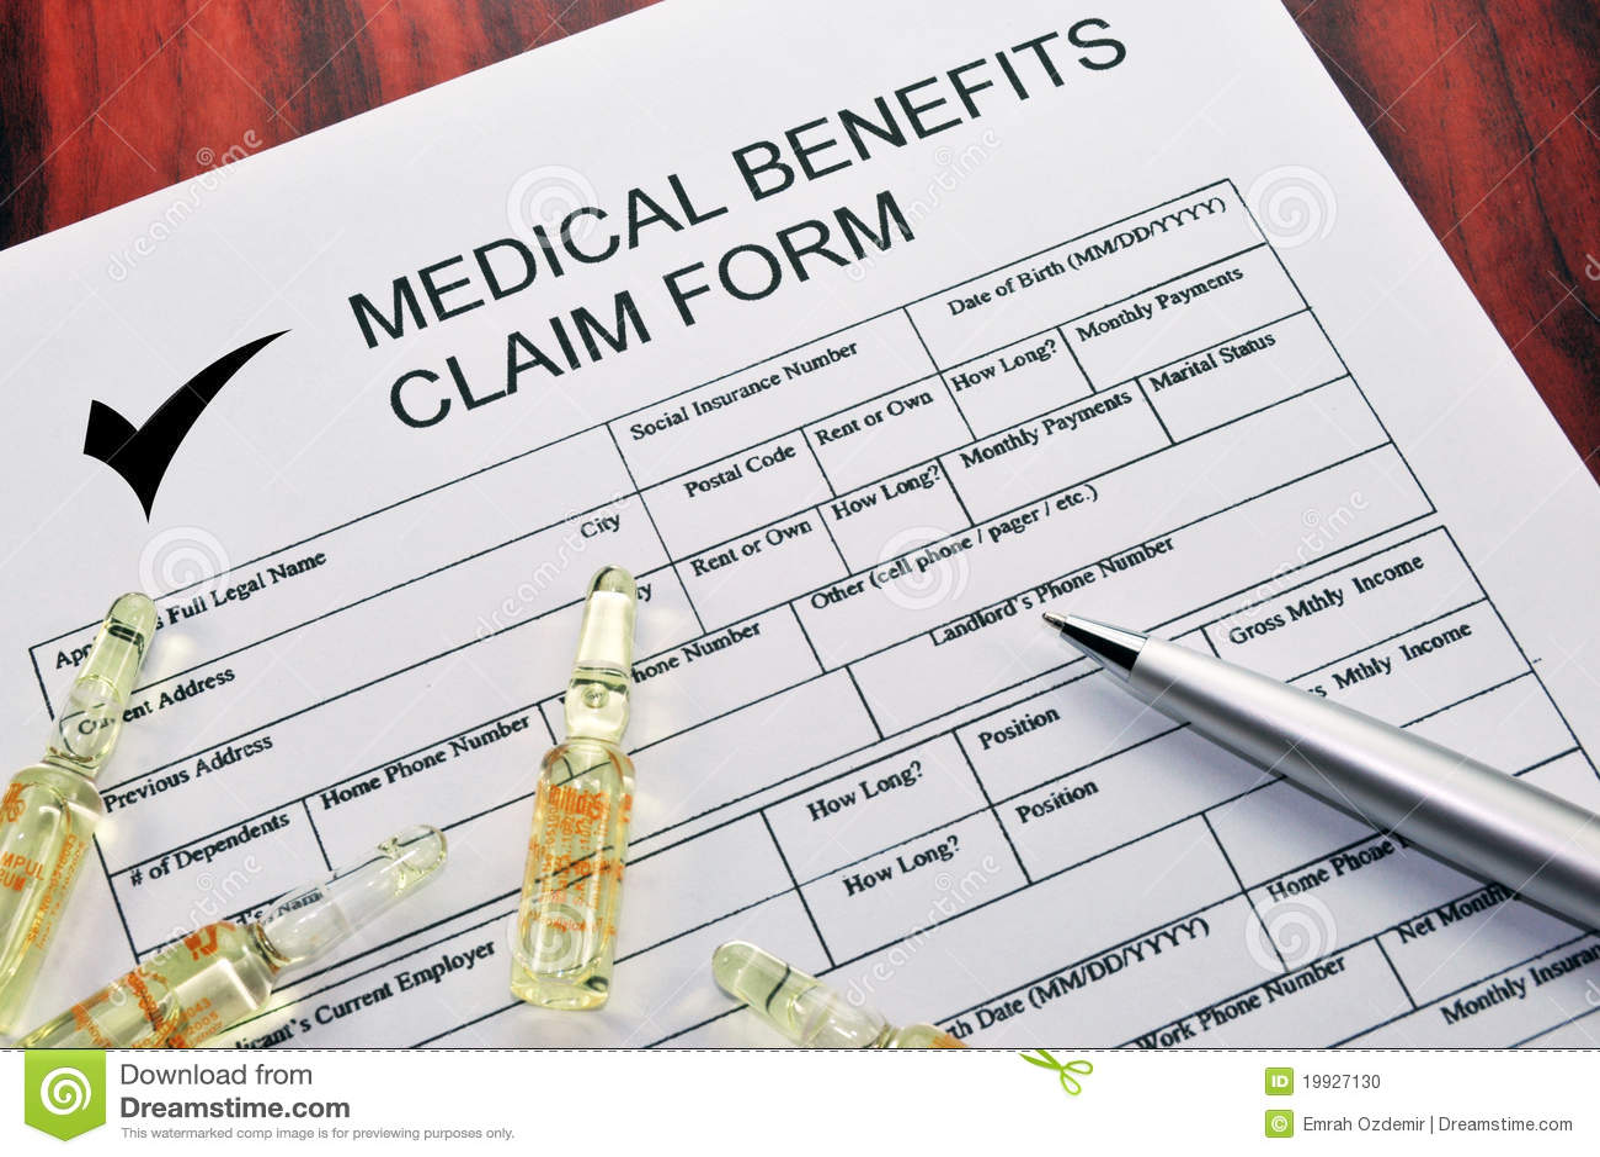 Medical Benefits Claim Form Photo Image 19927130 – Medical Claim Form